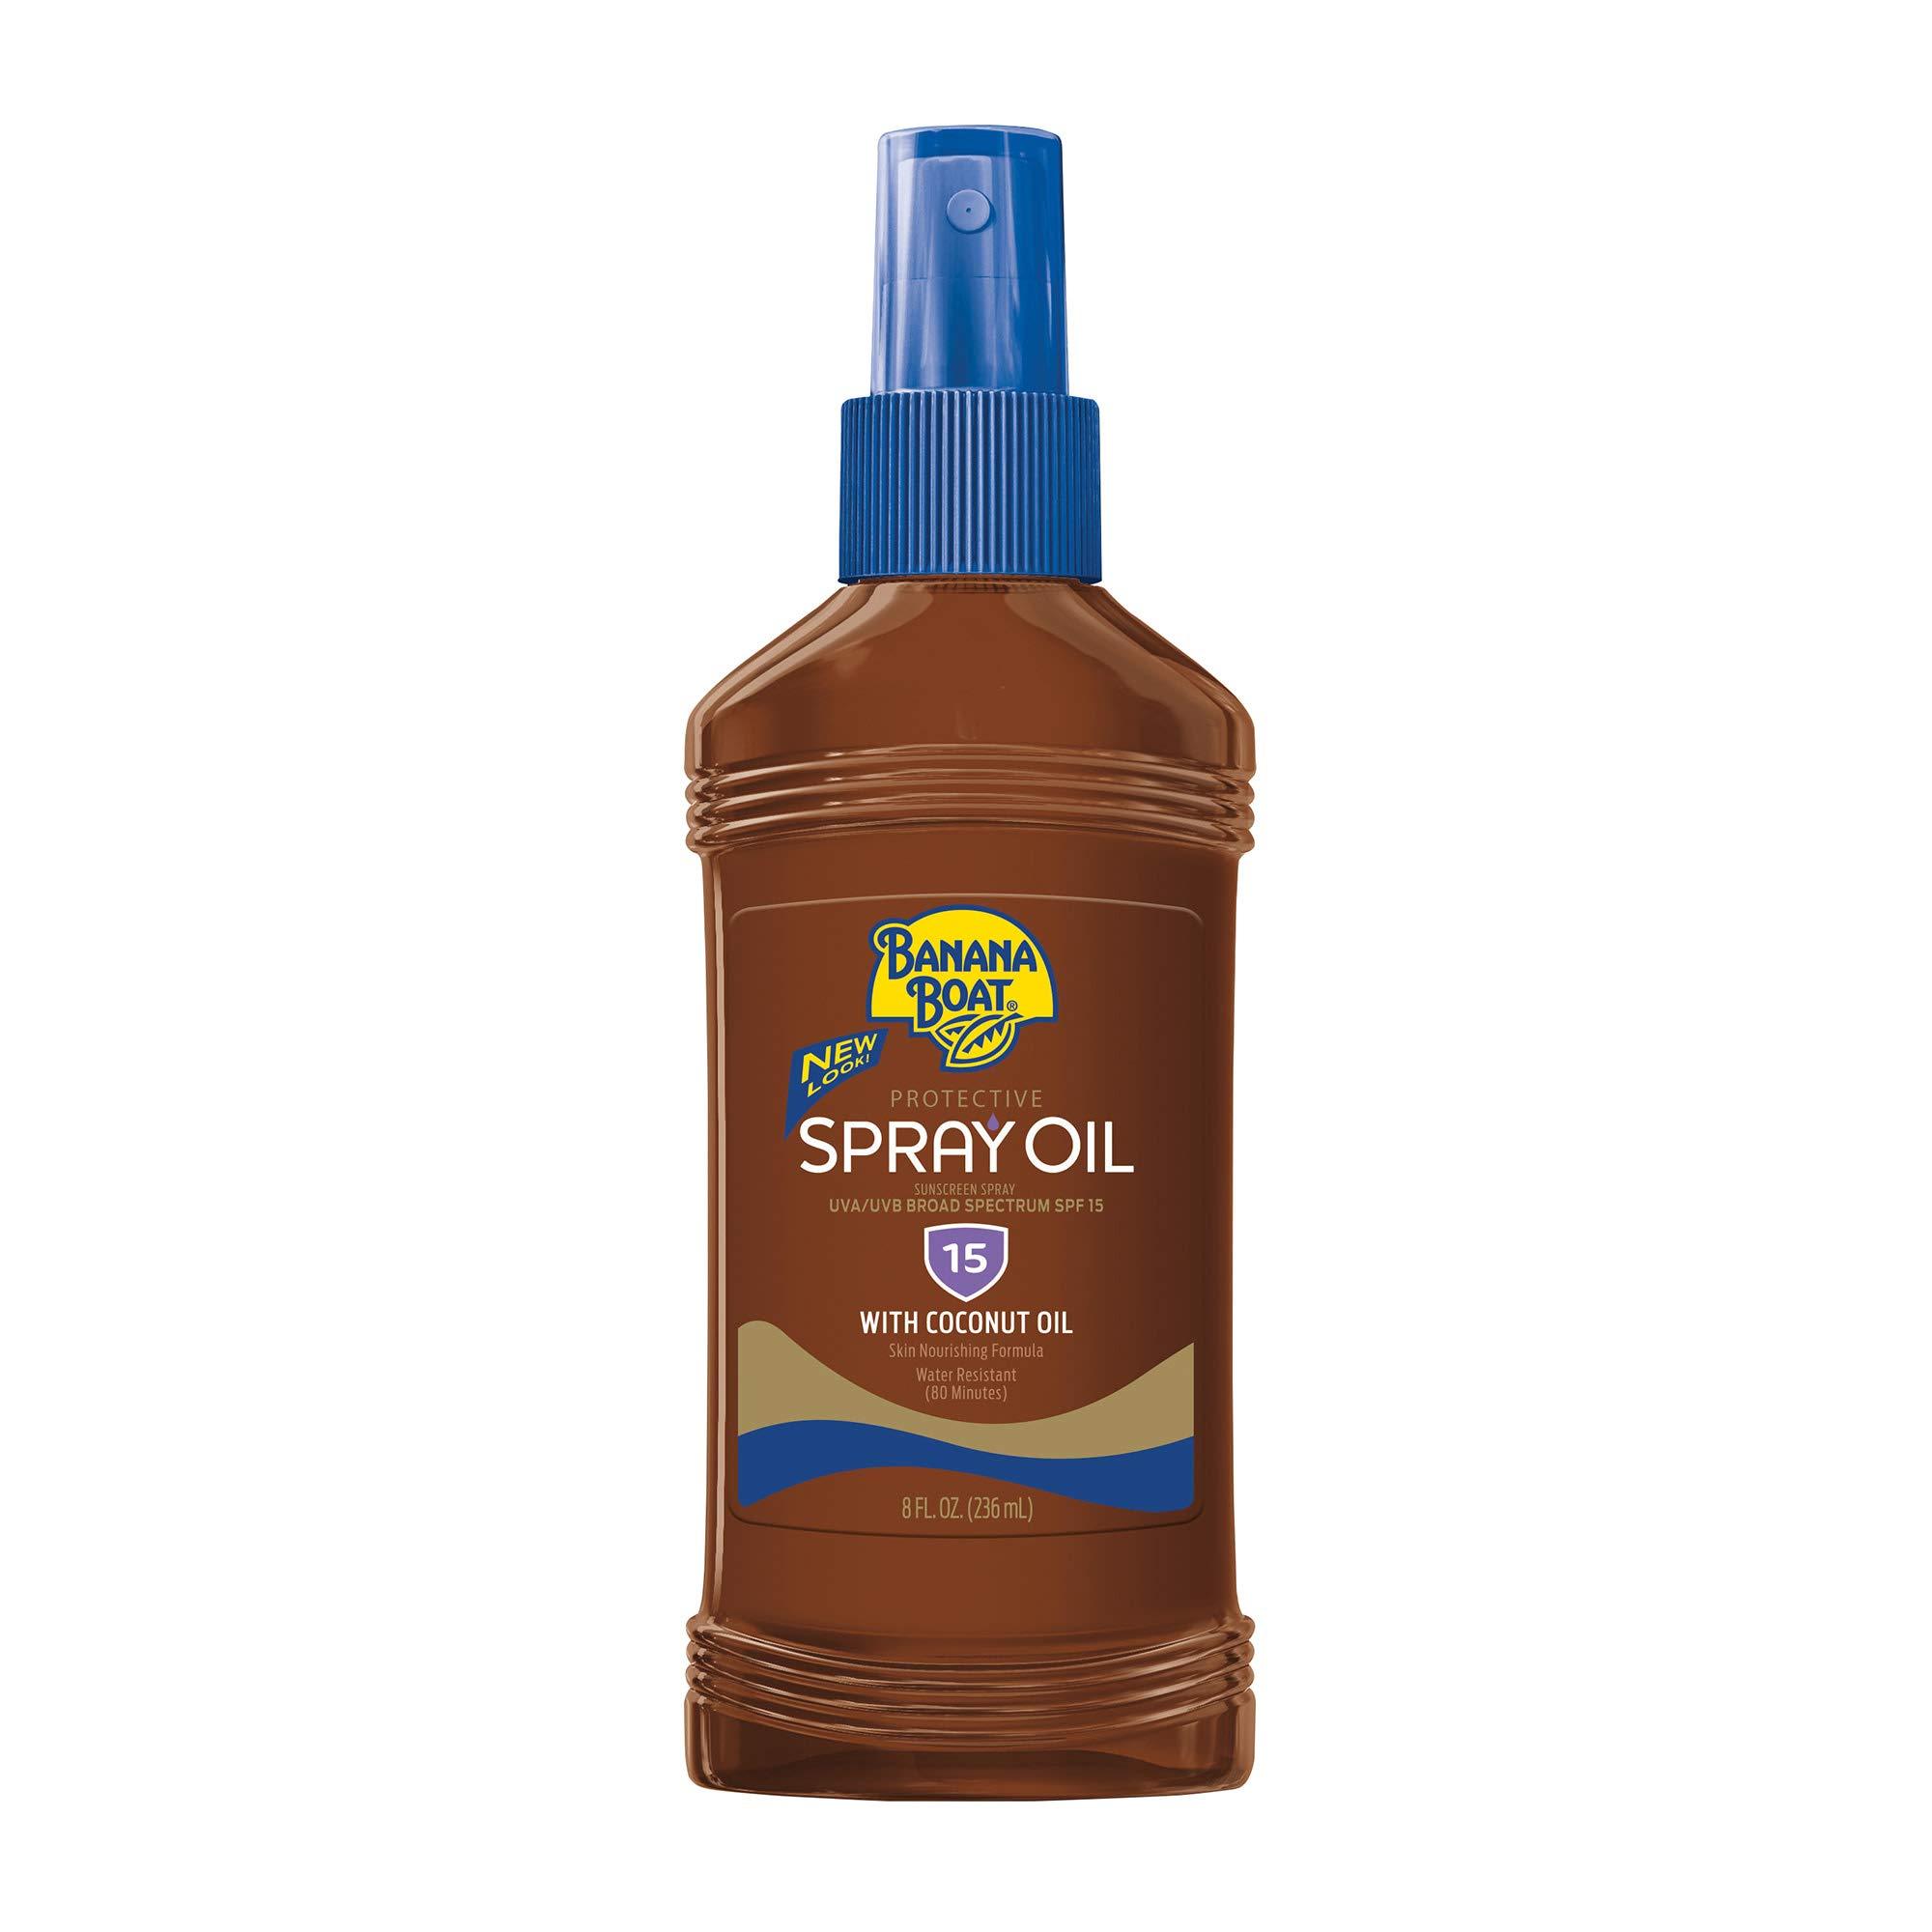 Banana Boat Protective Spray Oil, Sunscreen SPF 15 8 oz (Pack of 2)